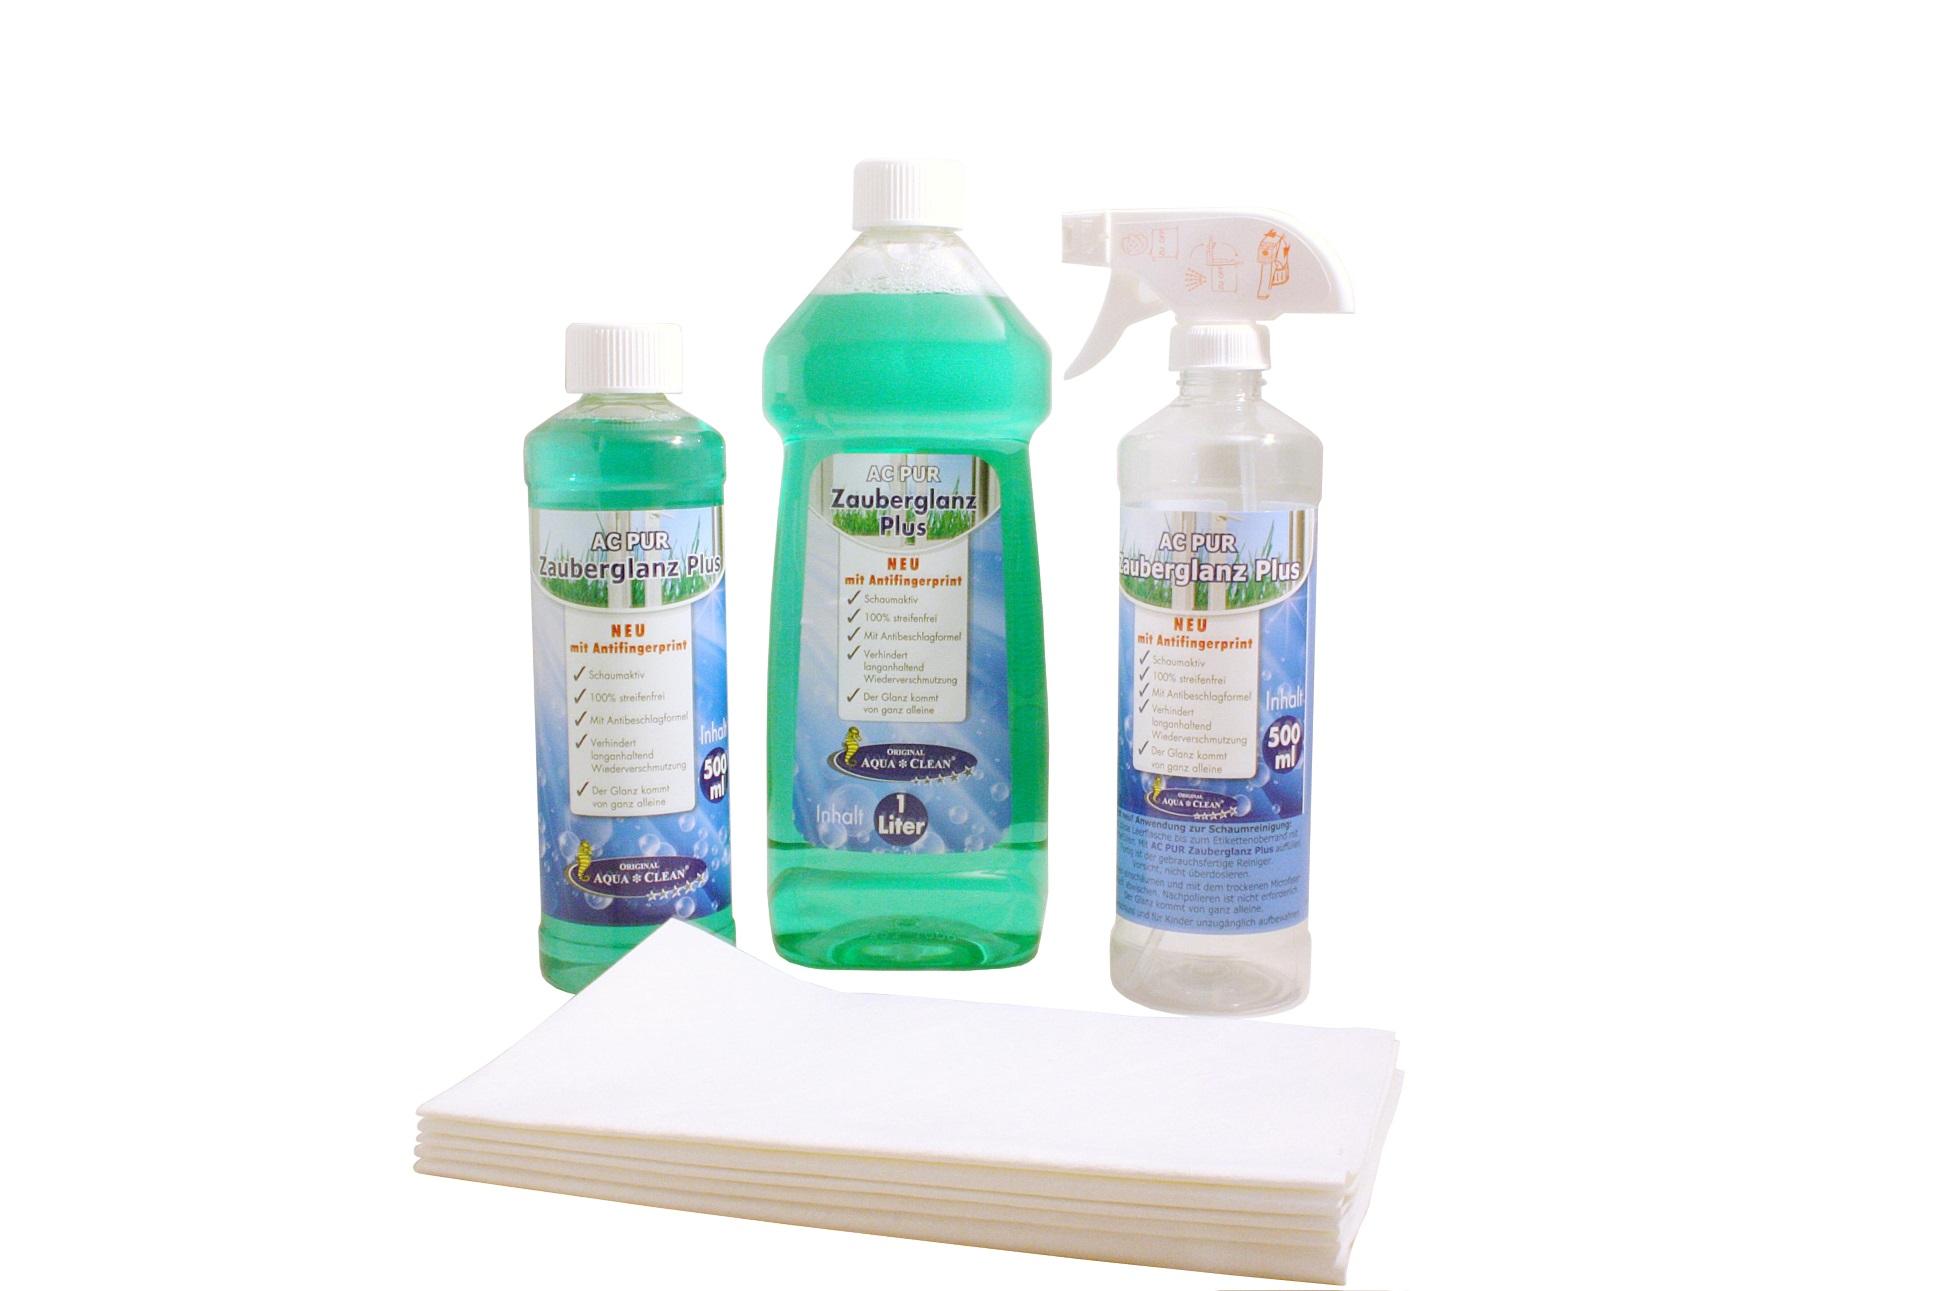 aqua clean pur zauberglanz fensterreiniger anti. Black Bedroom Furniture Sets. Home Design Ideas